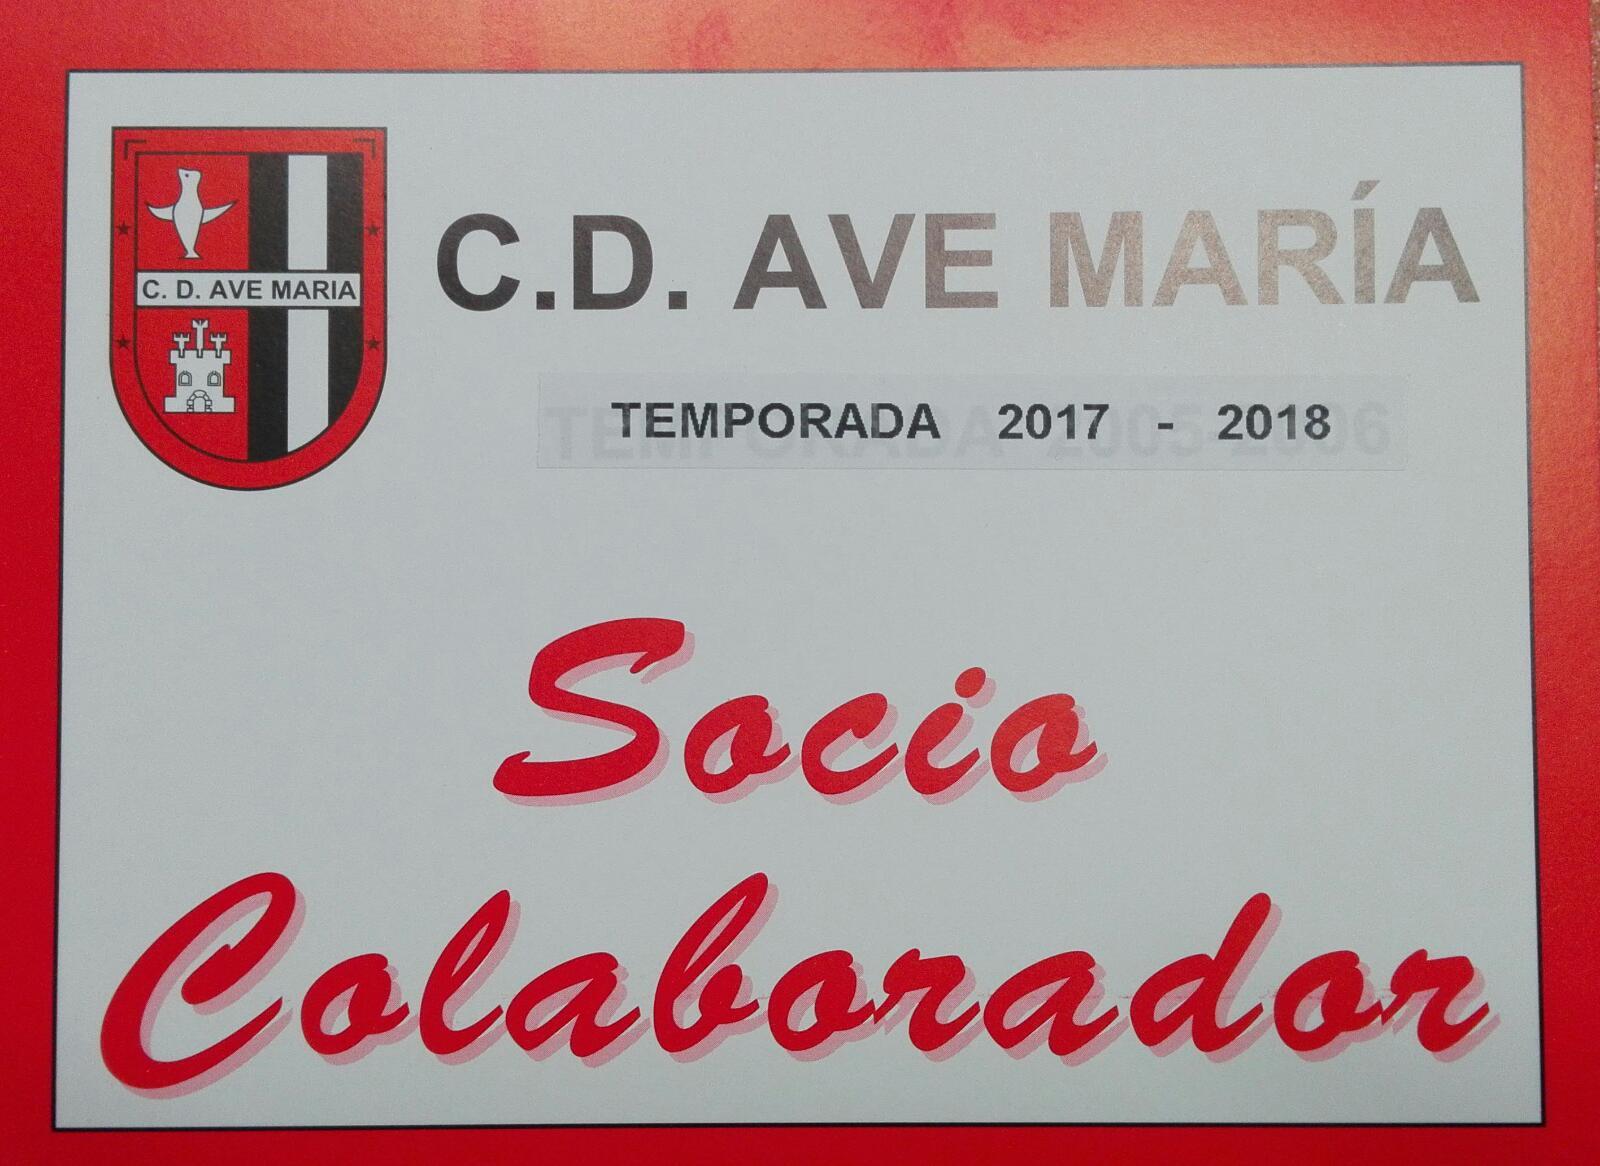 ave-maria-colaboracion-2018